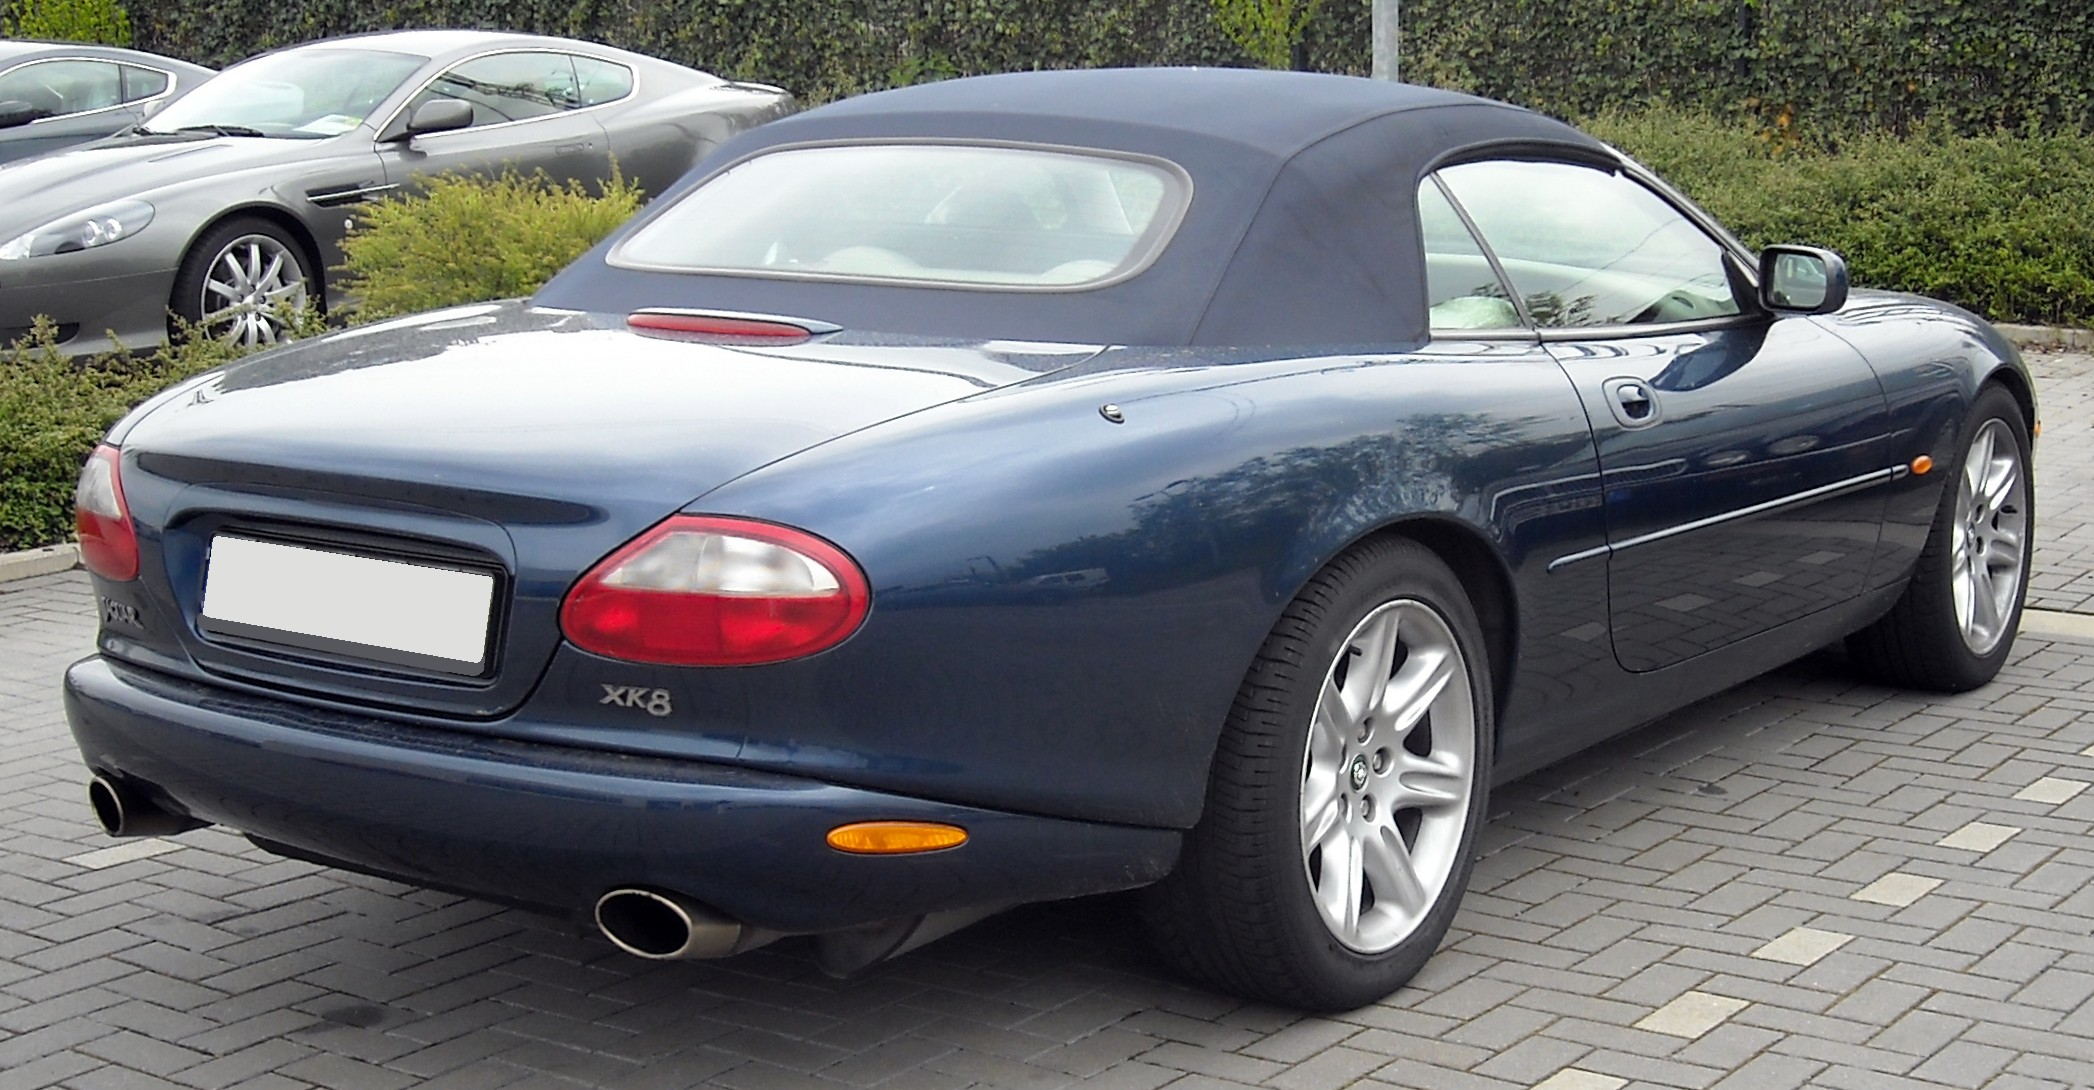 File:Jaguar X100 Convertible rear 20090430.jpg - Wikimedia ...